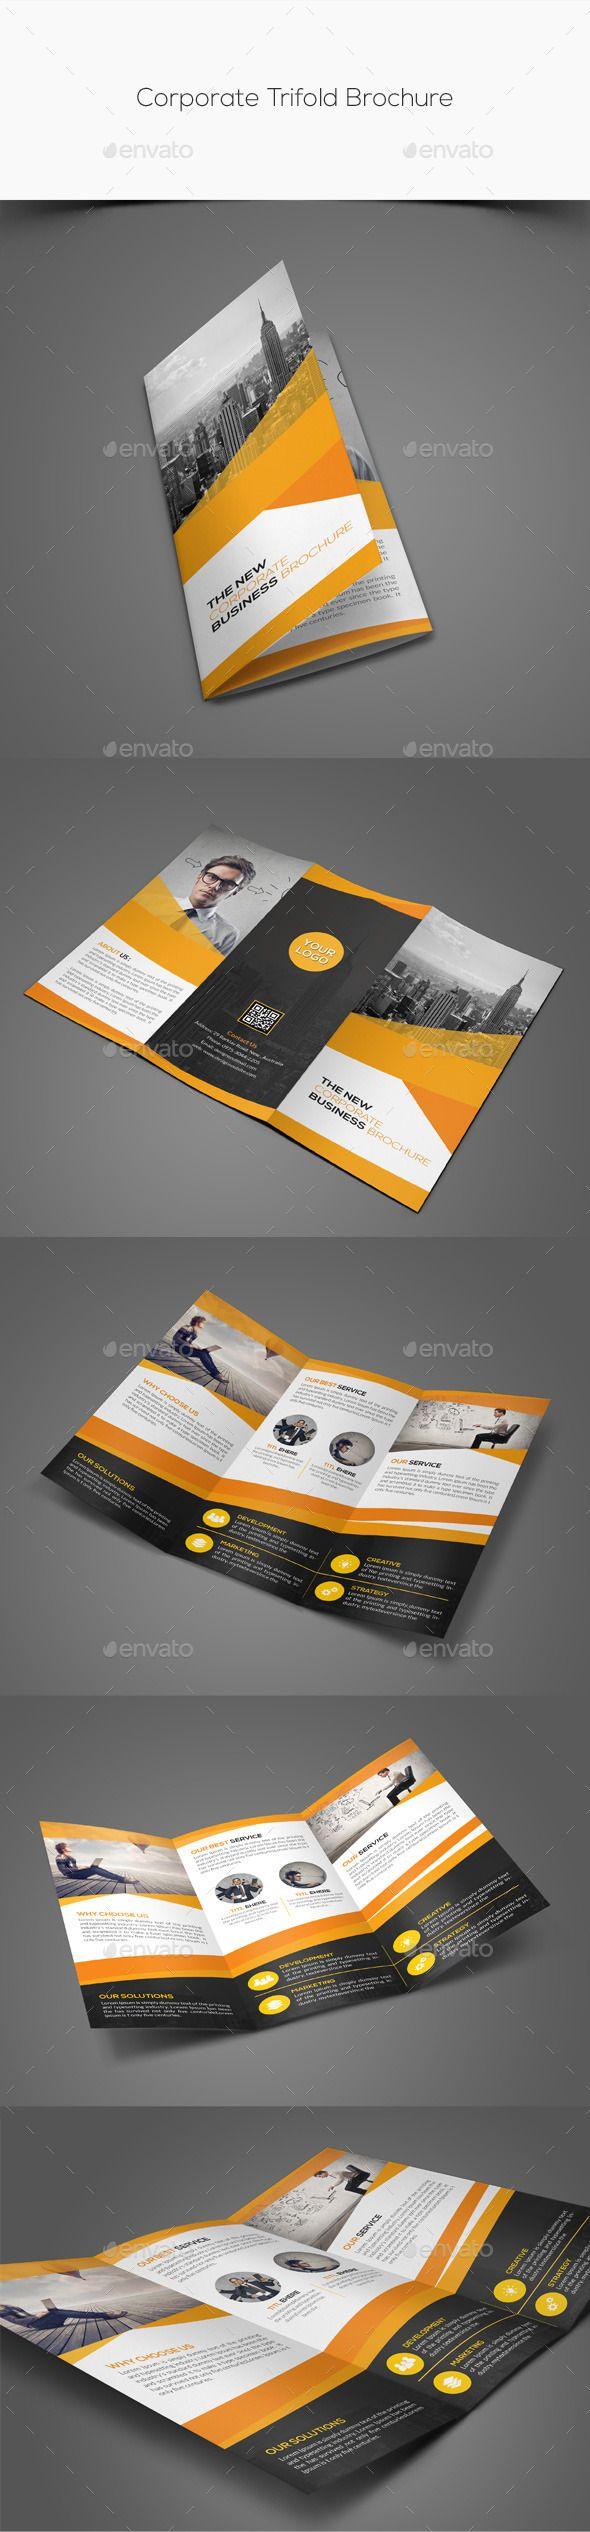 Corporate Trifold Brochure Template brochure Download